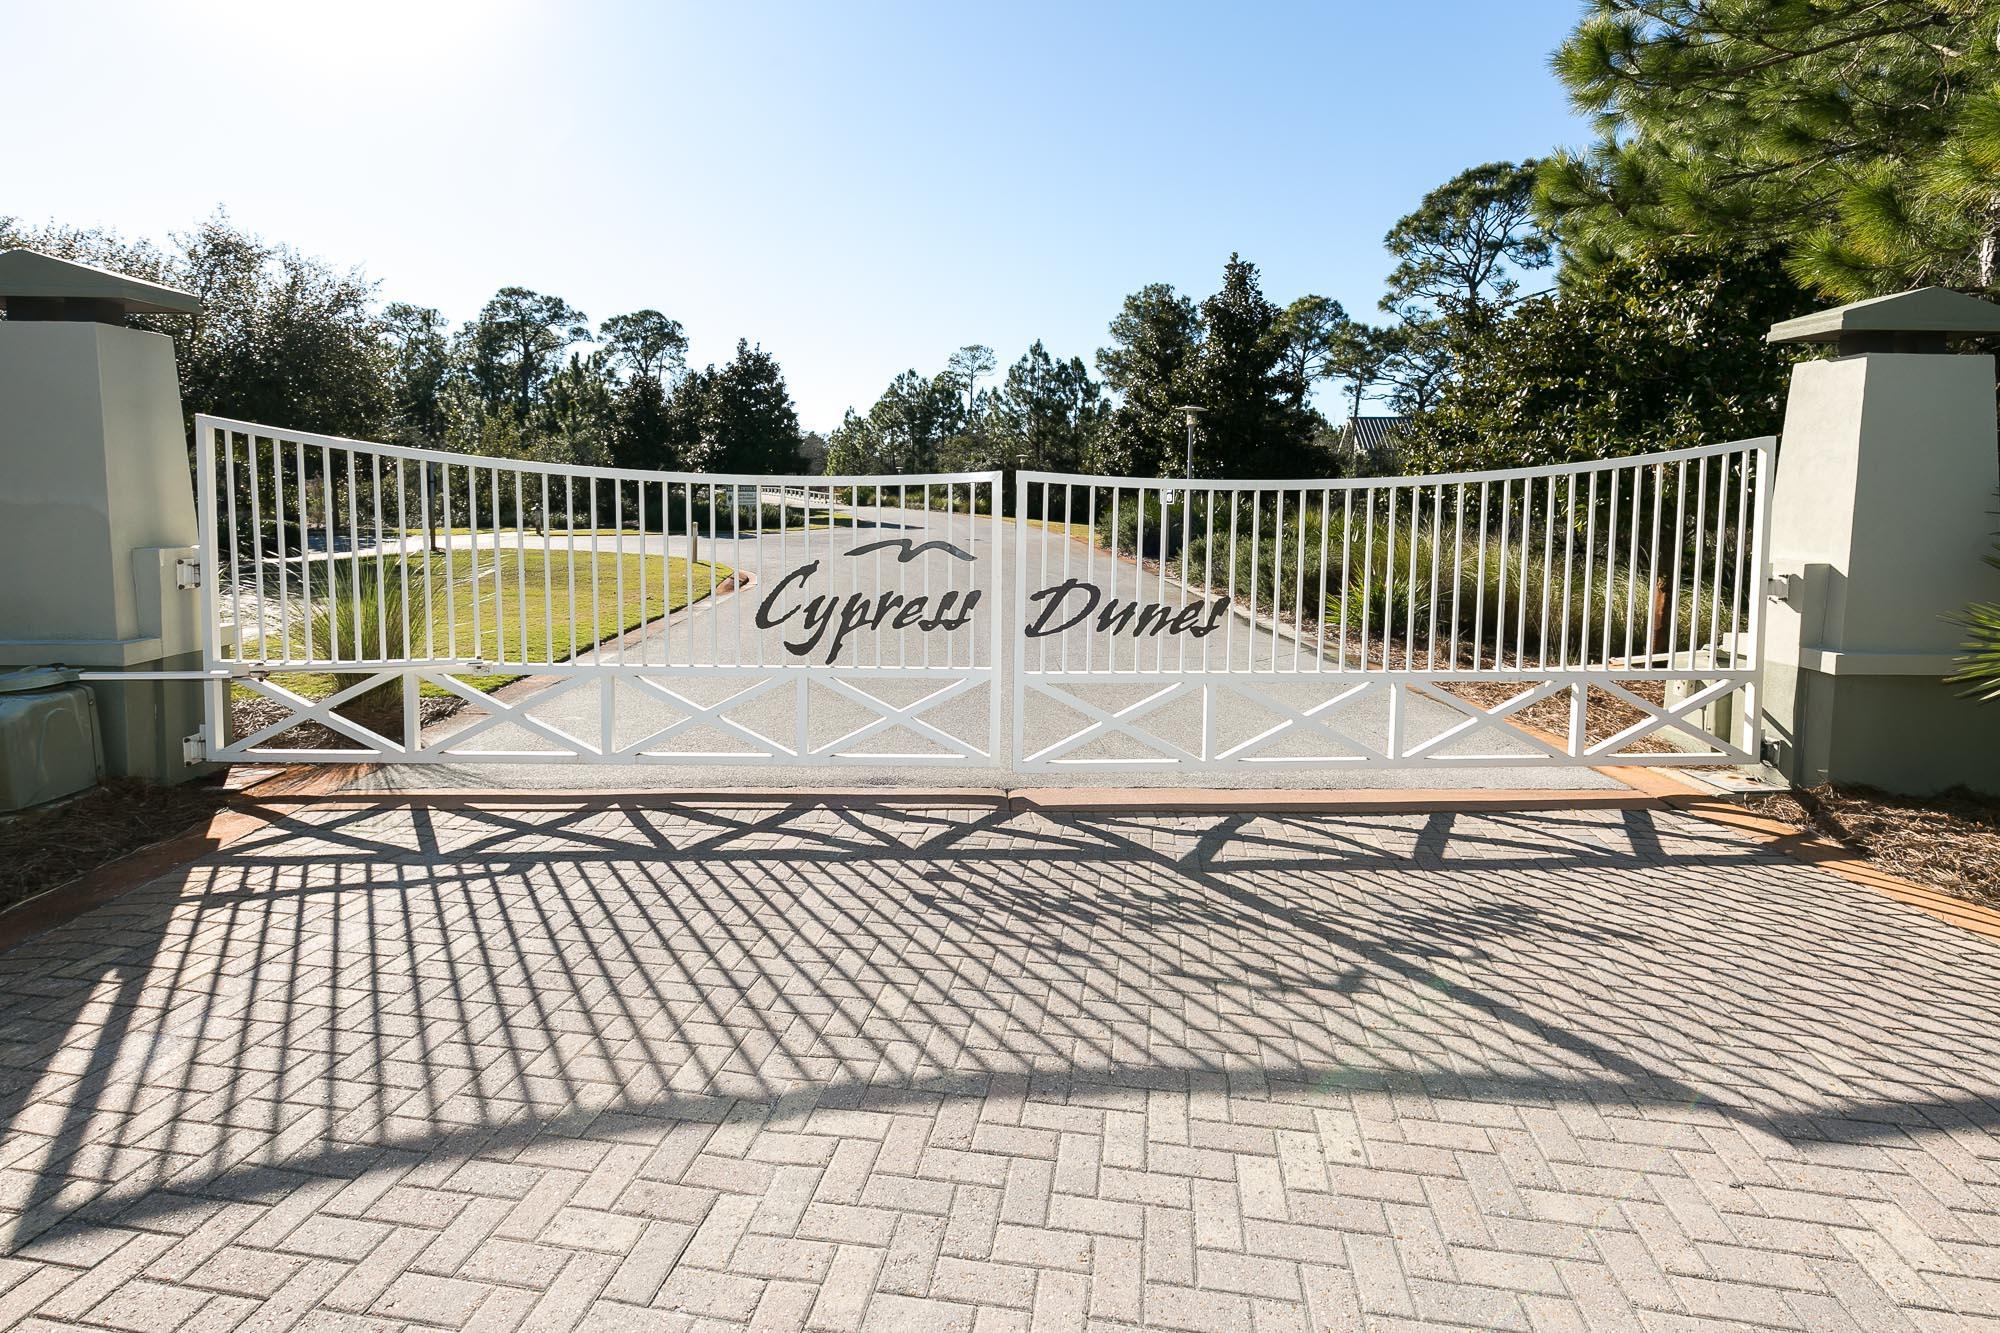 Cypress Dunes gate Phase 1